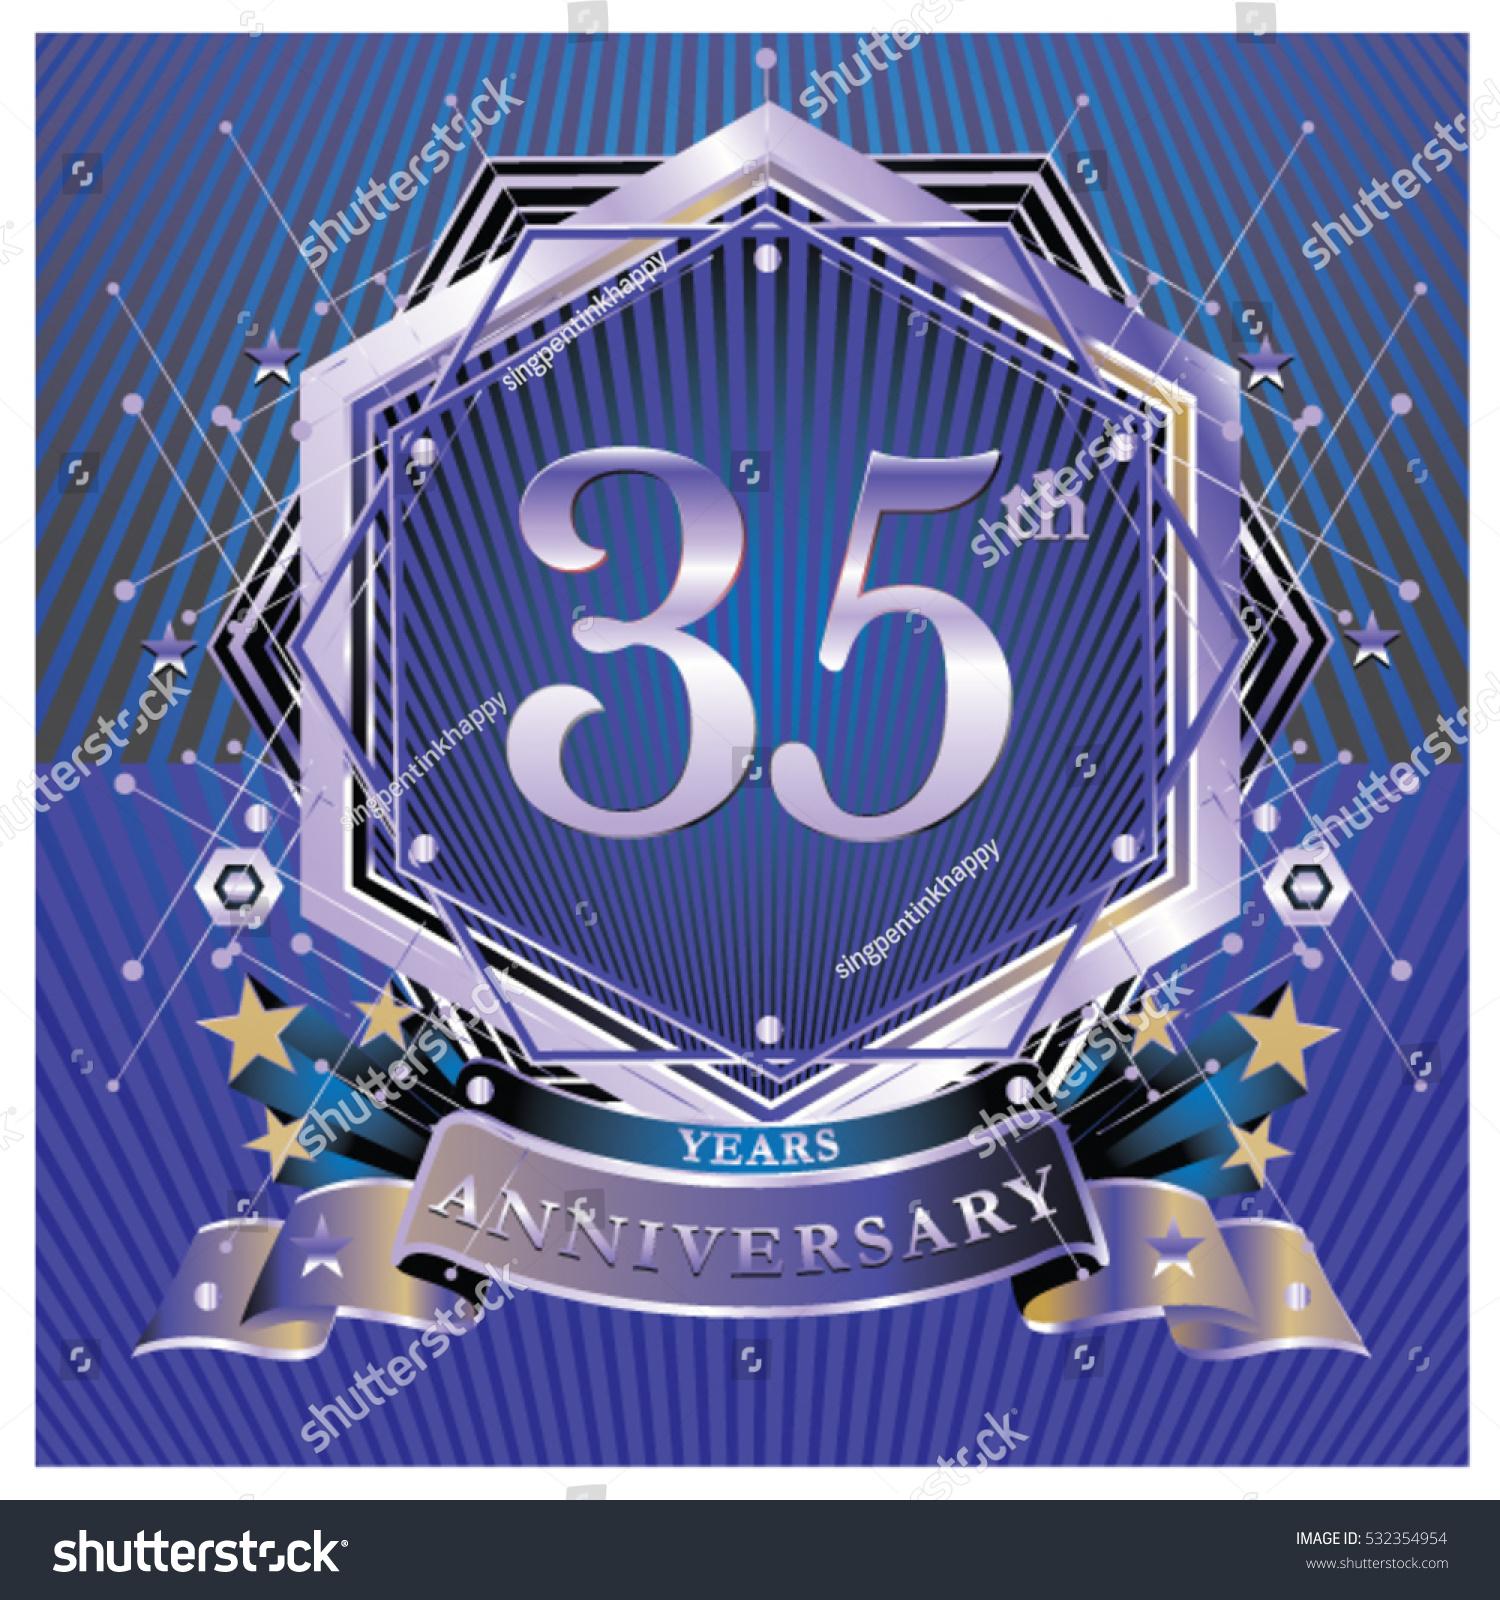 35 Years Anniversary Logo Celebration Ring Stock Vector 532354954